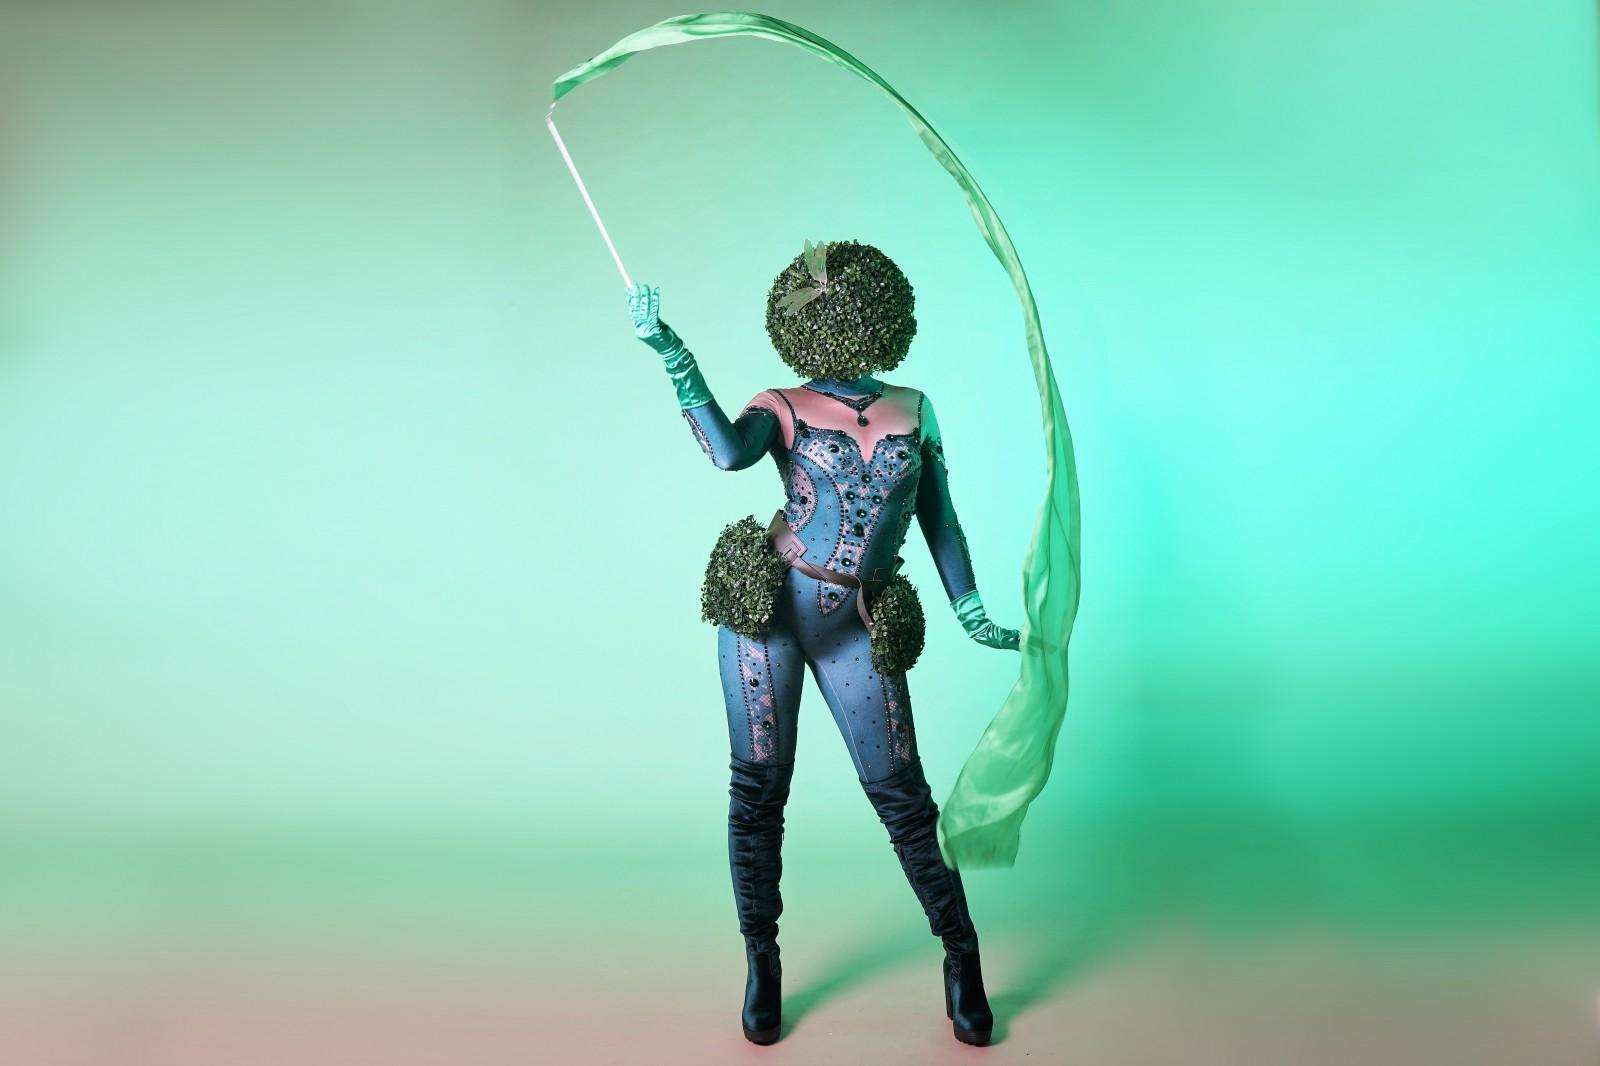 Garden girl, botanic theme, thema kostuum, freesyle danser, silk danser, event entertainmnet, tuin thema, plant thema, groen thema, special character